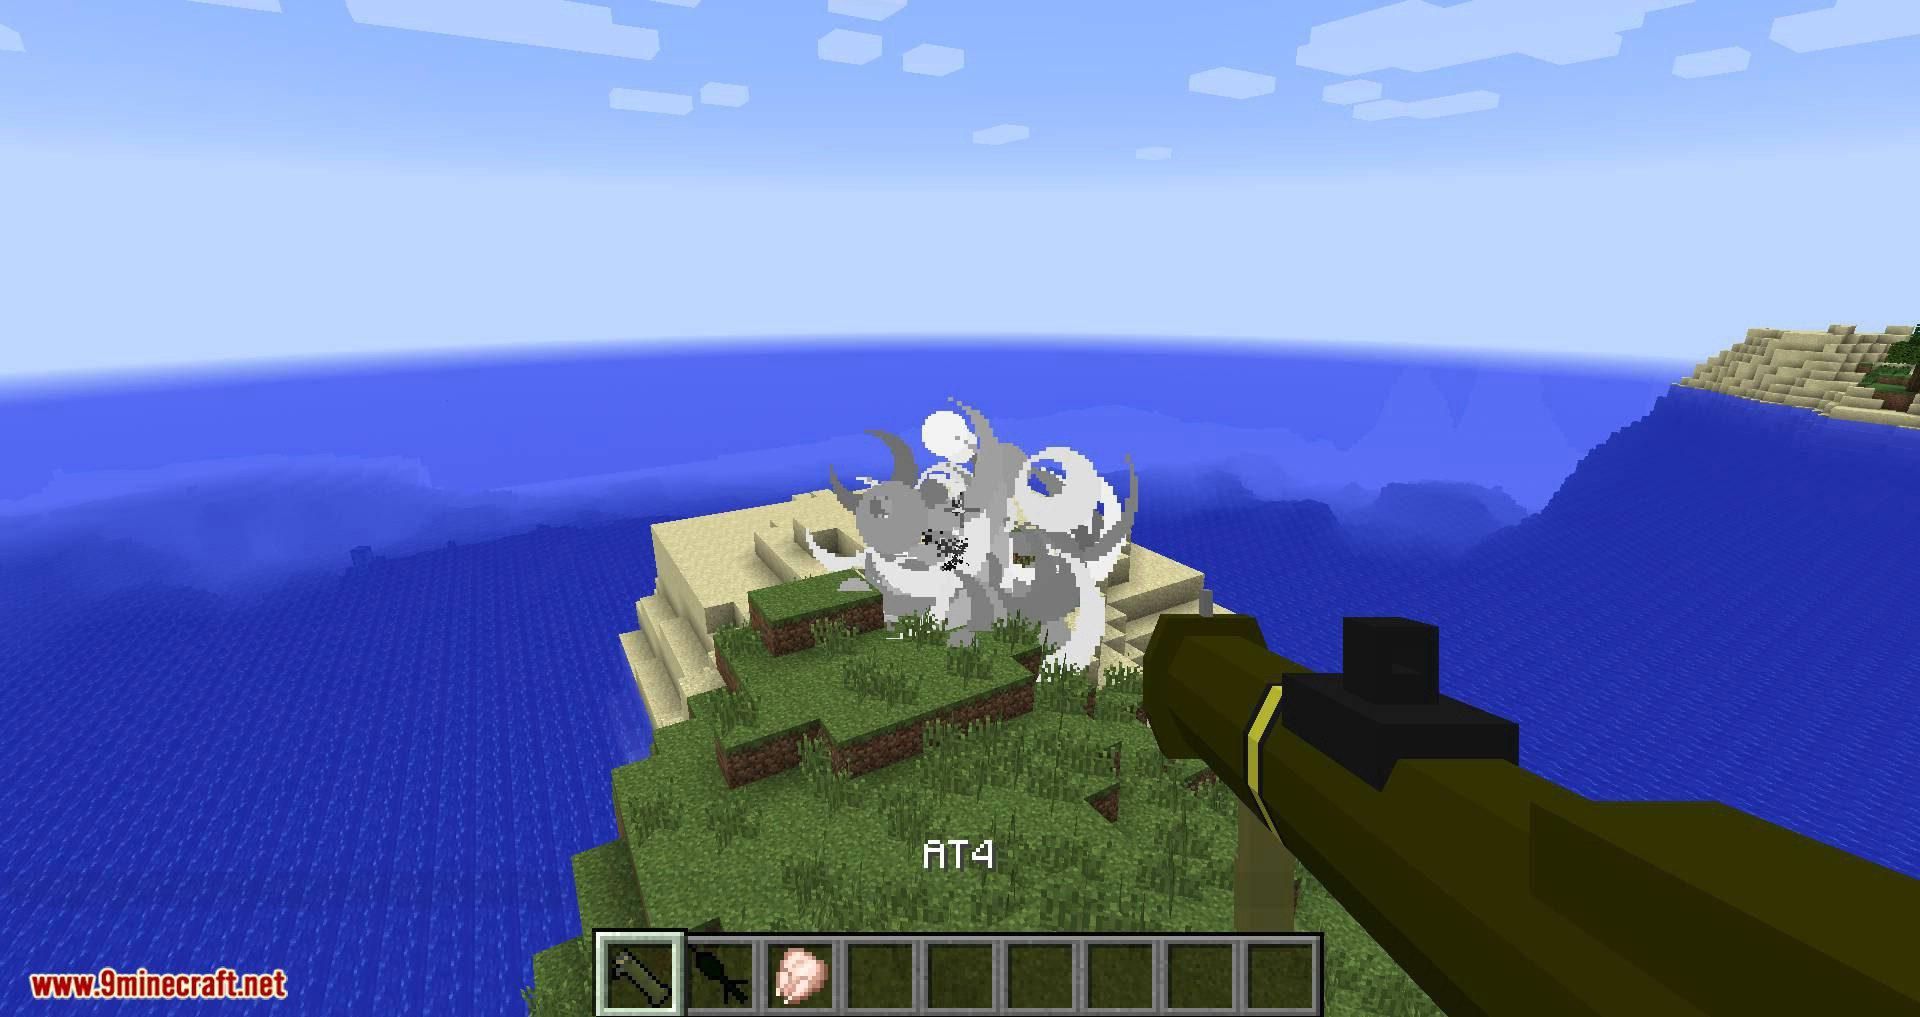 Flan_s Content Pack World War 3 mod for minecraft 10